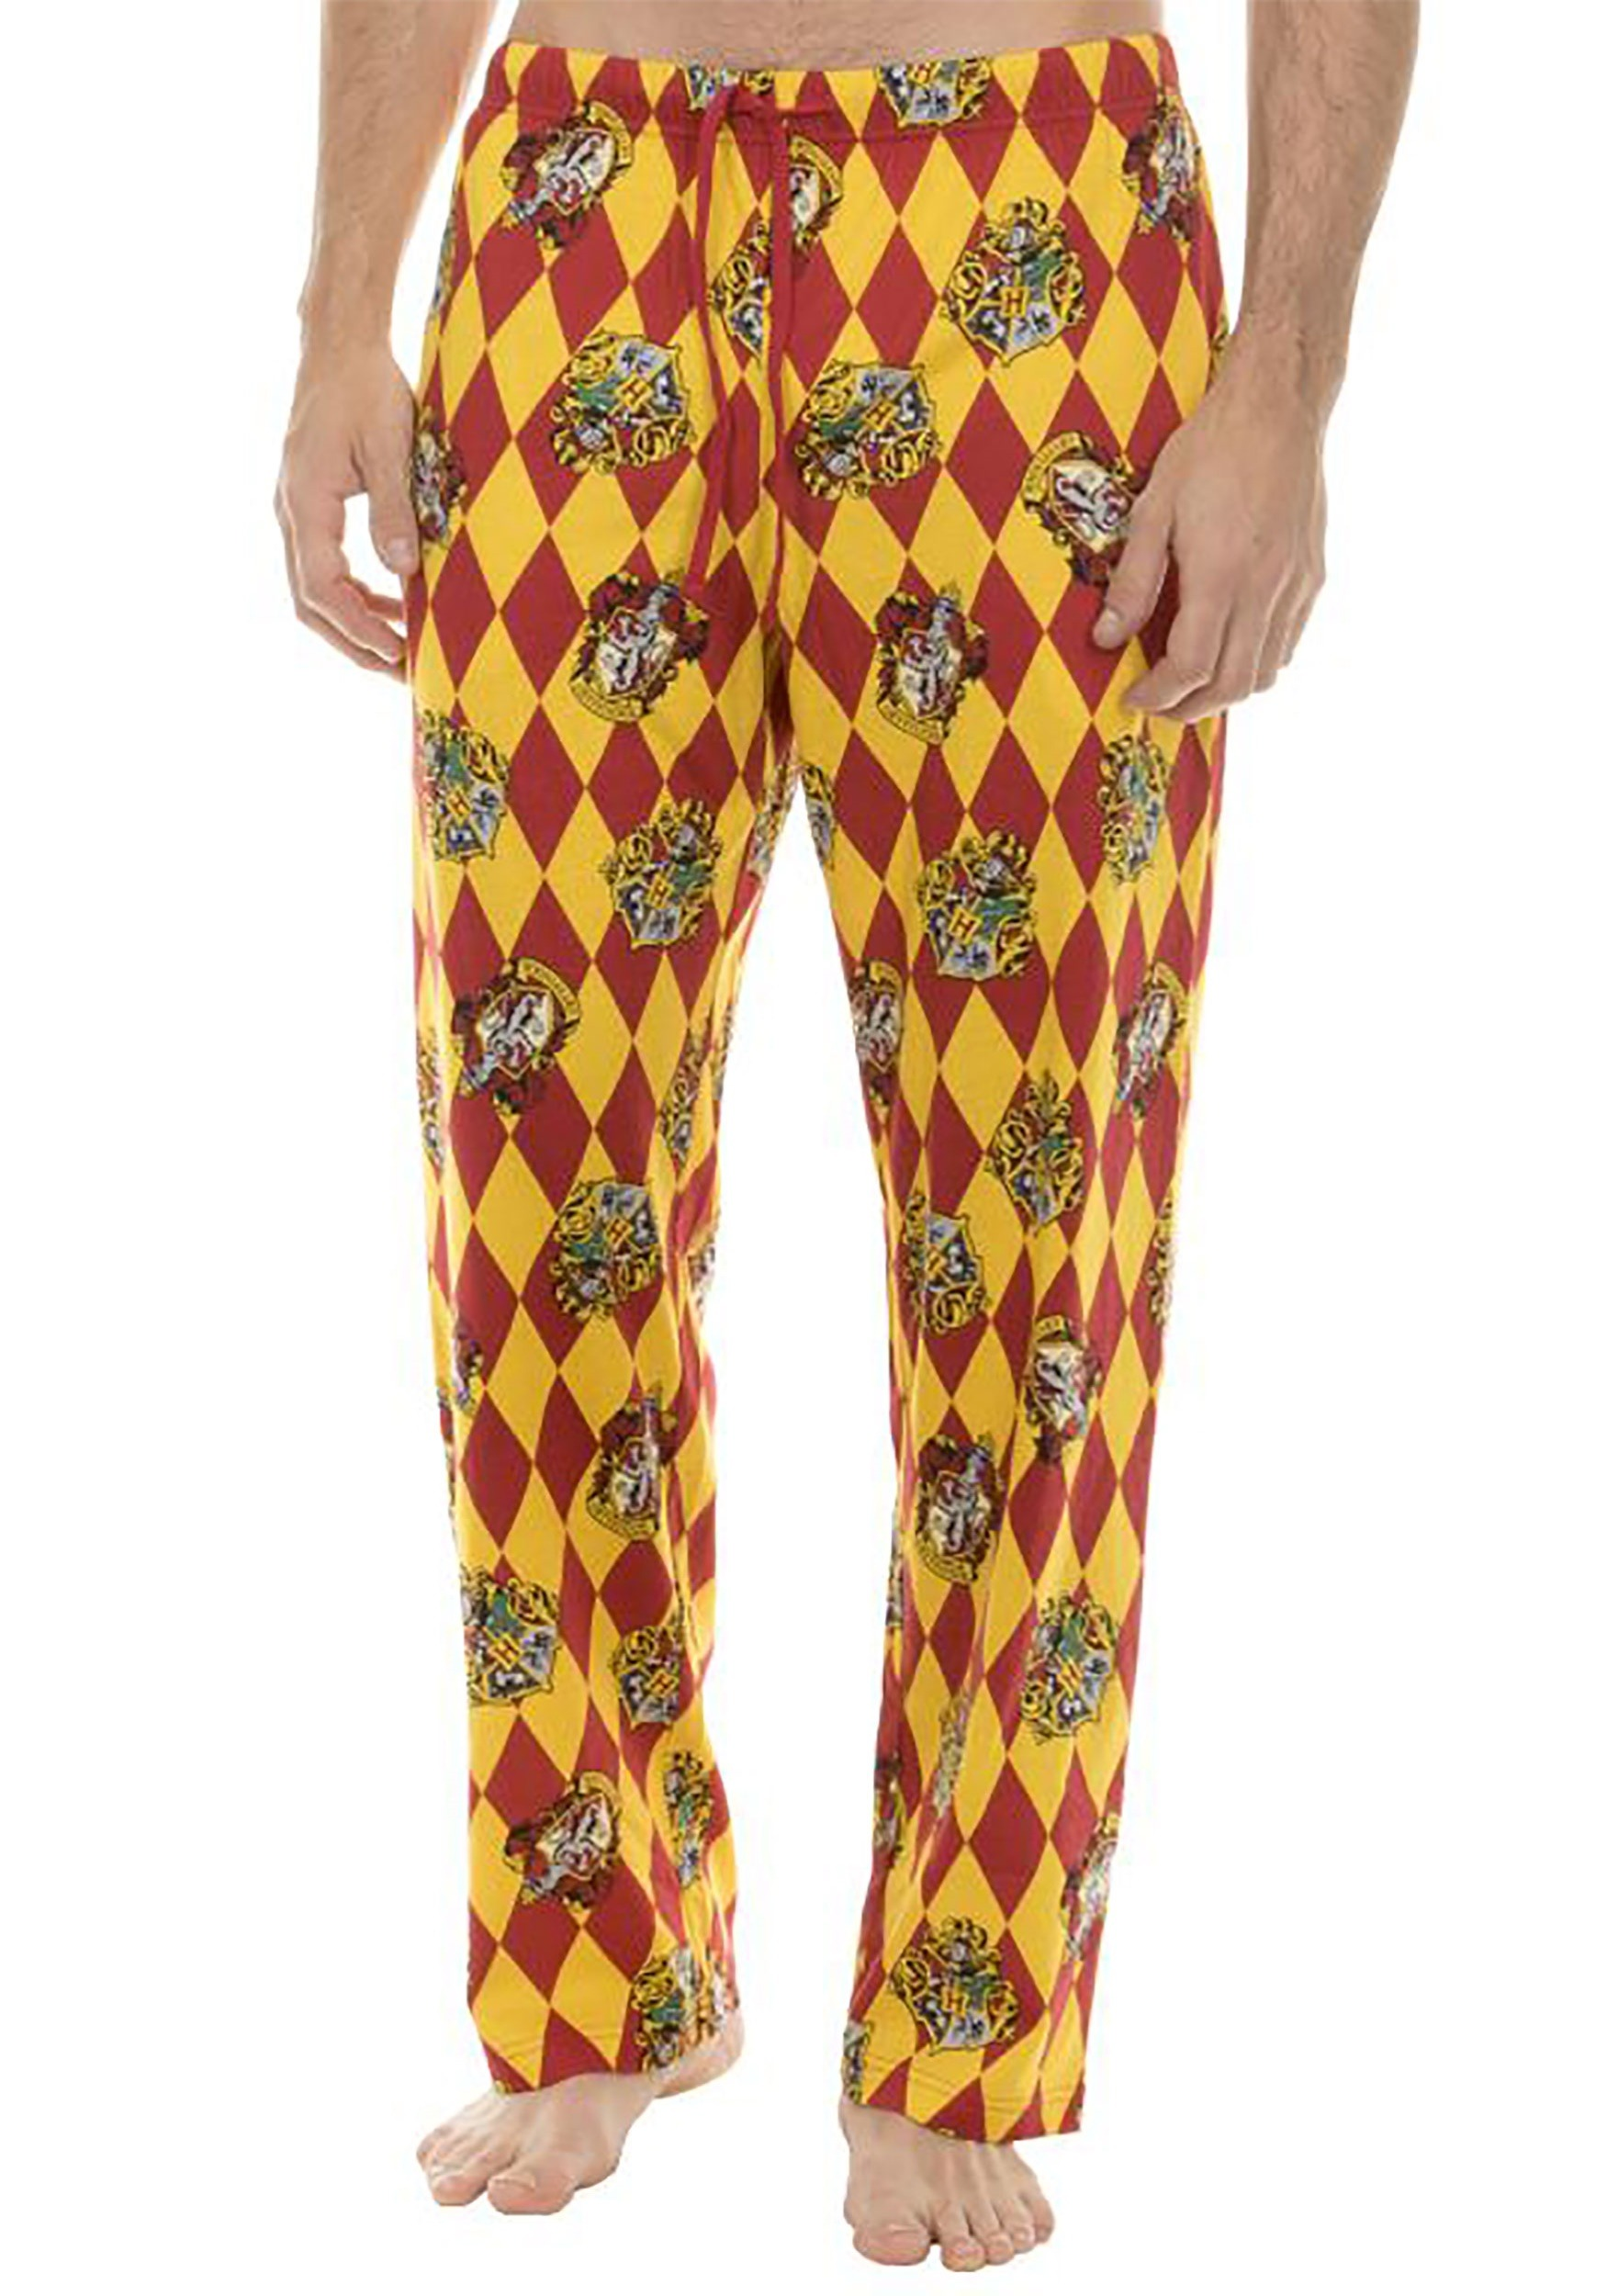 19e6361e7a439 Harry Potter Hogwarts Crest Lounge Pants